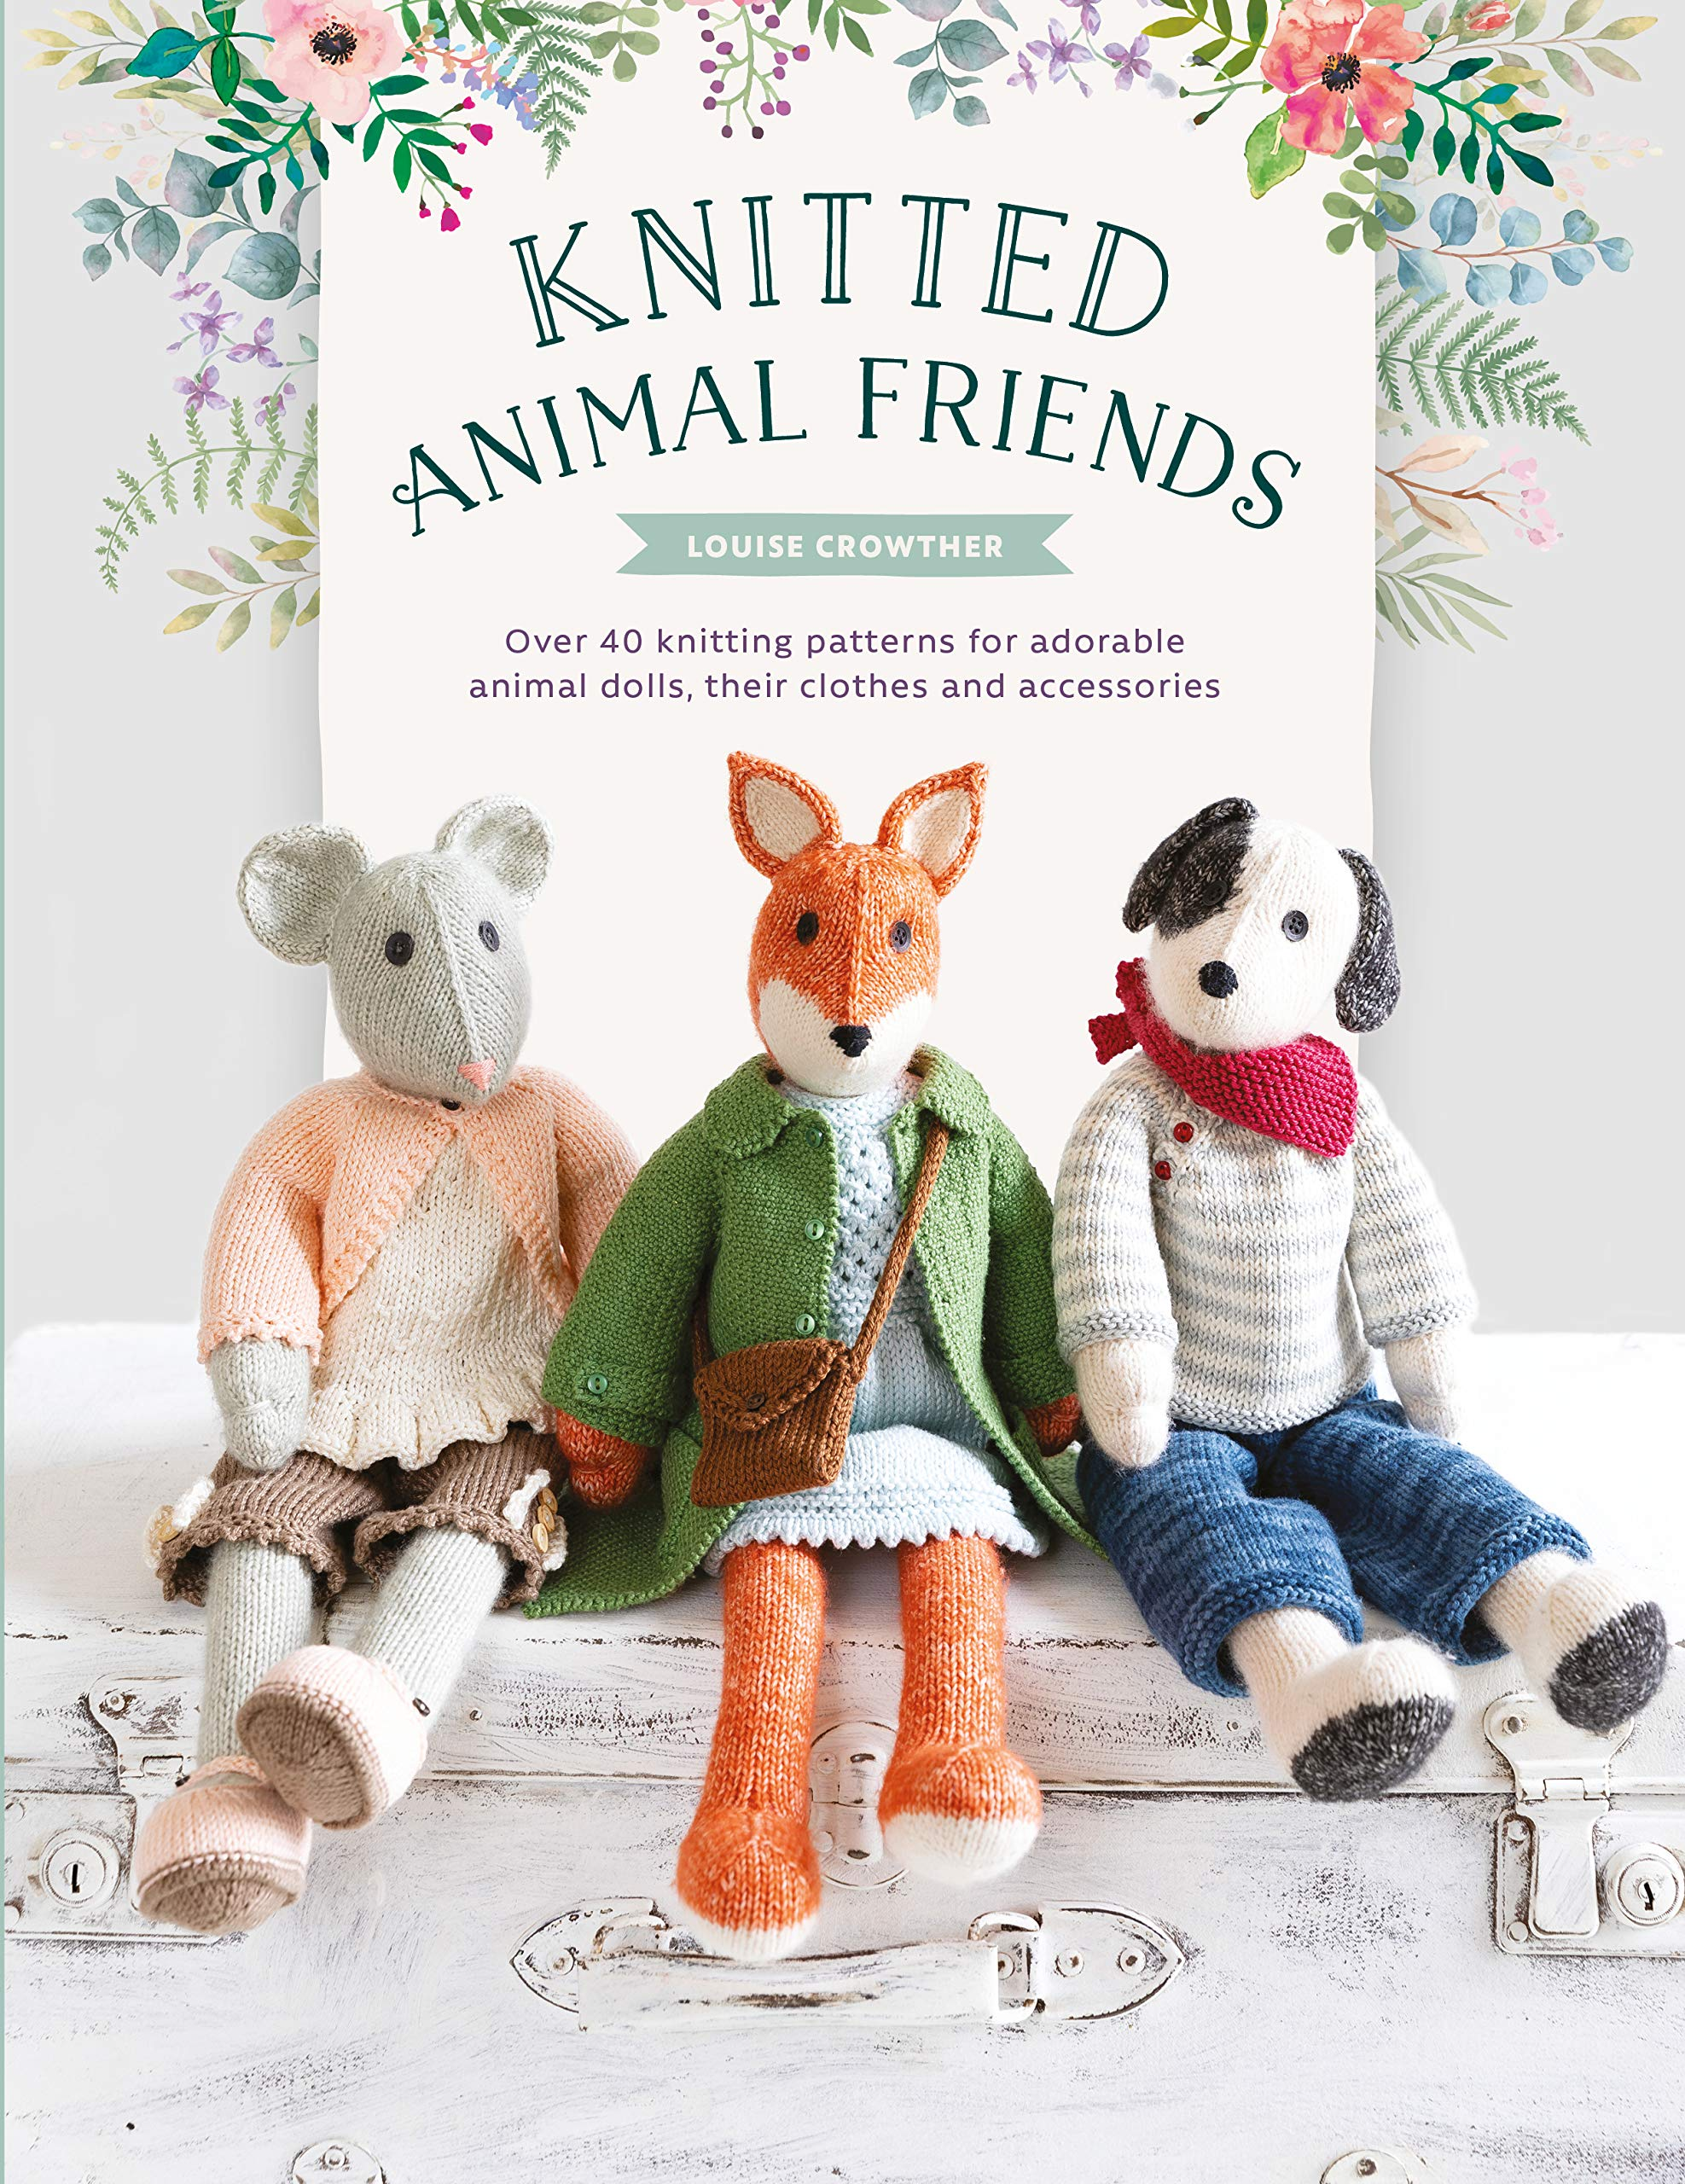 crocheted knitted stuffed plush dog soft animal pattern dog toy doll PATTERN Crochet dog amigurumi toys pdf crochet cartoon toy pattern